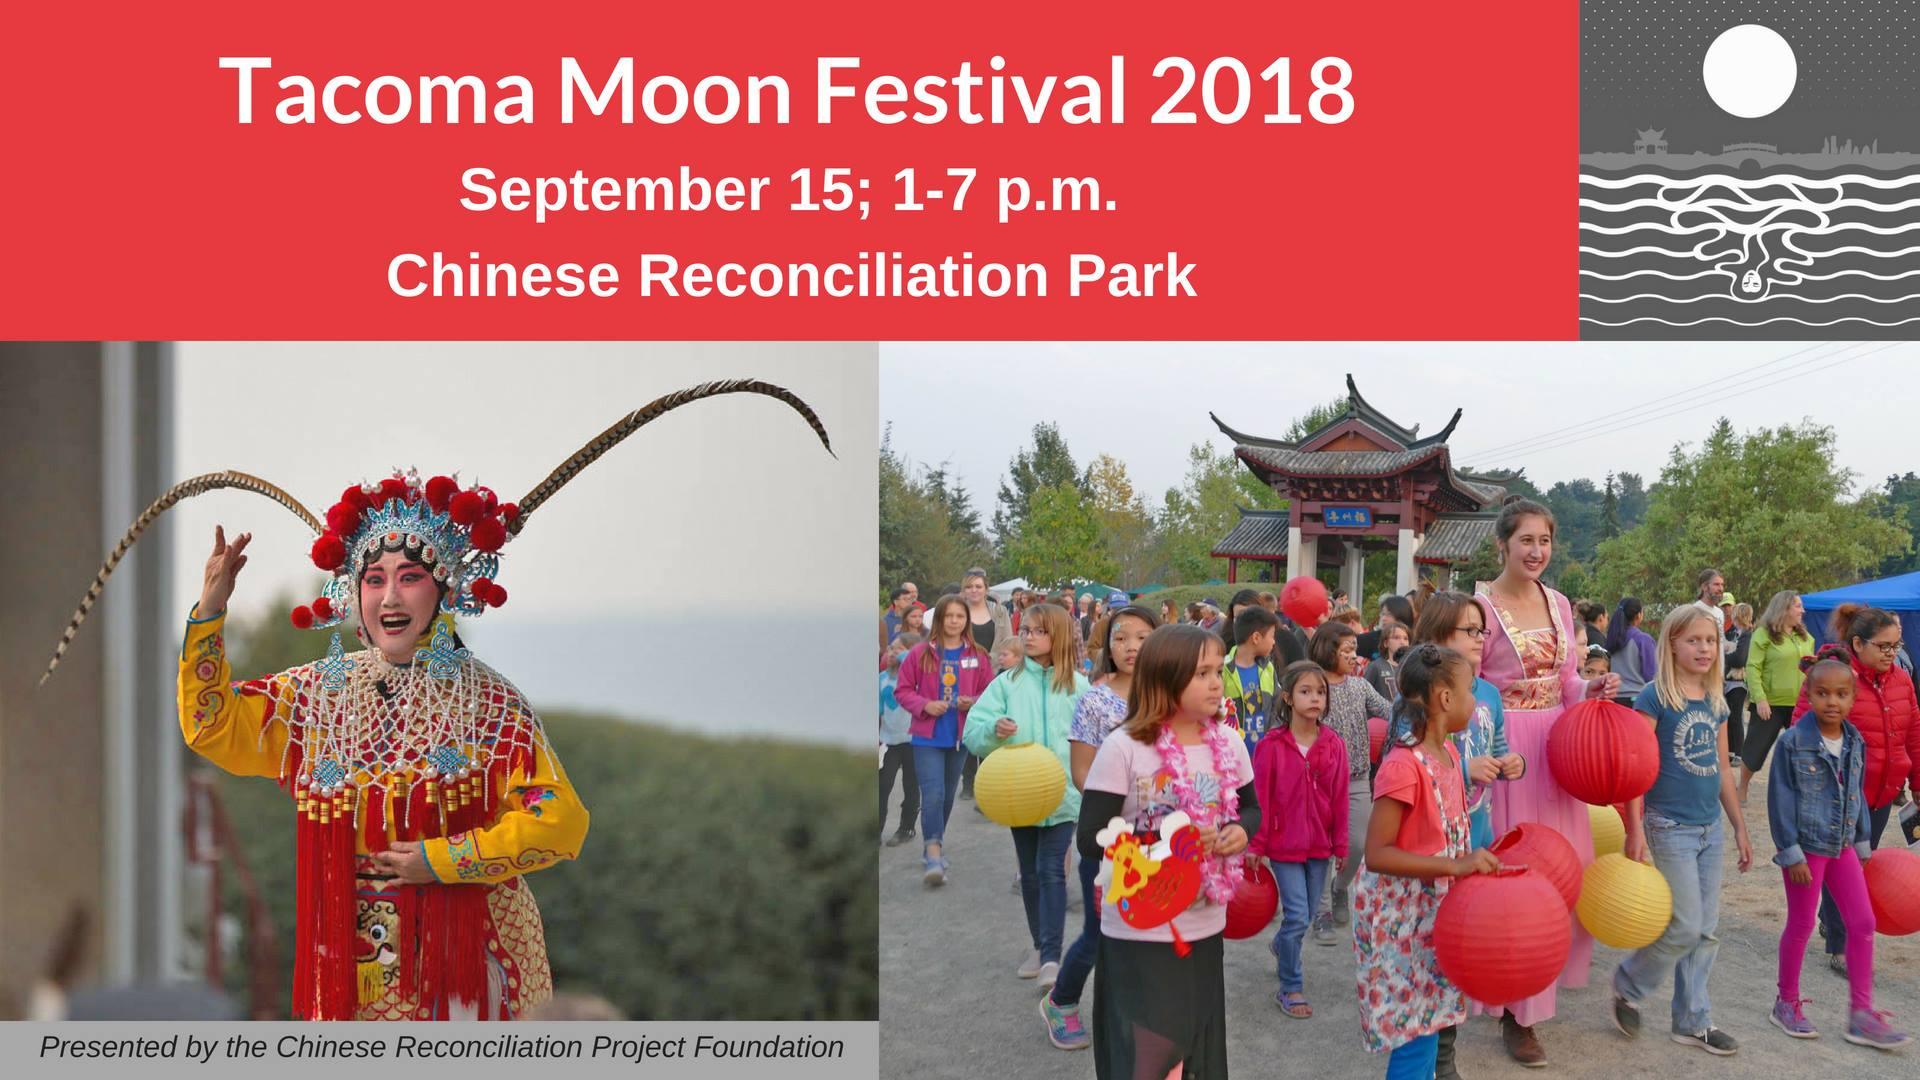 tac-moon-festival.jpg